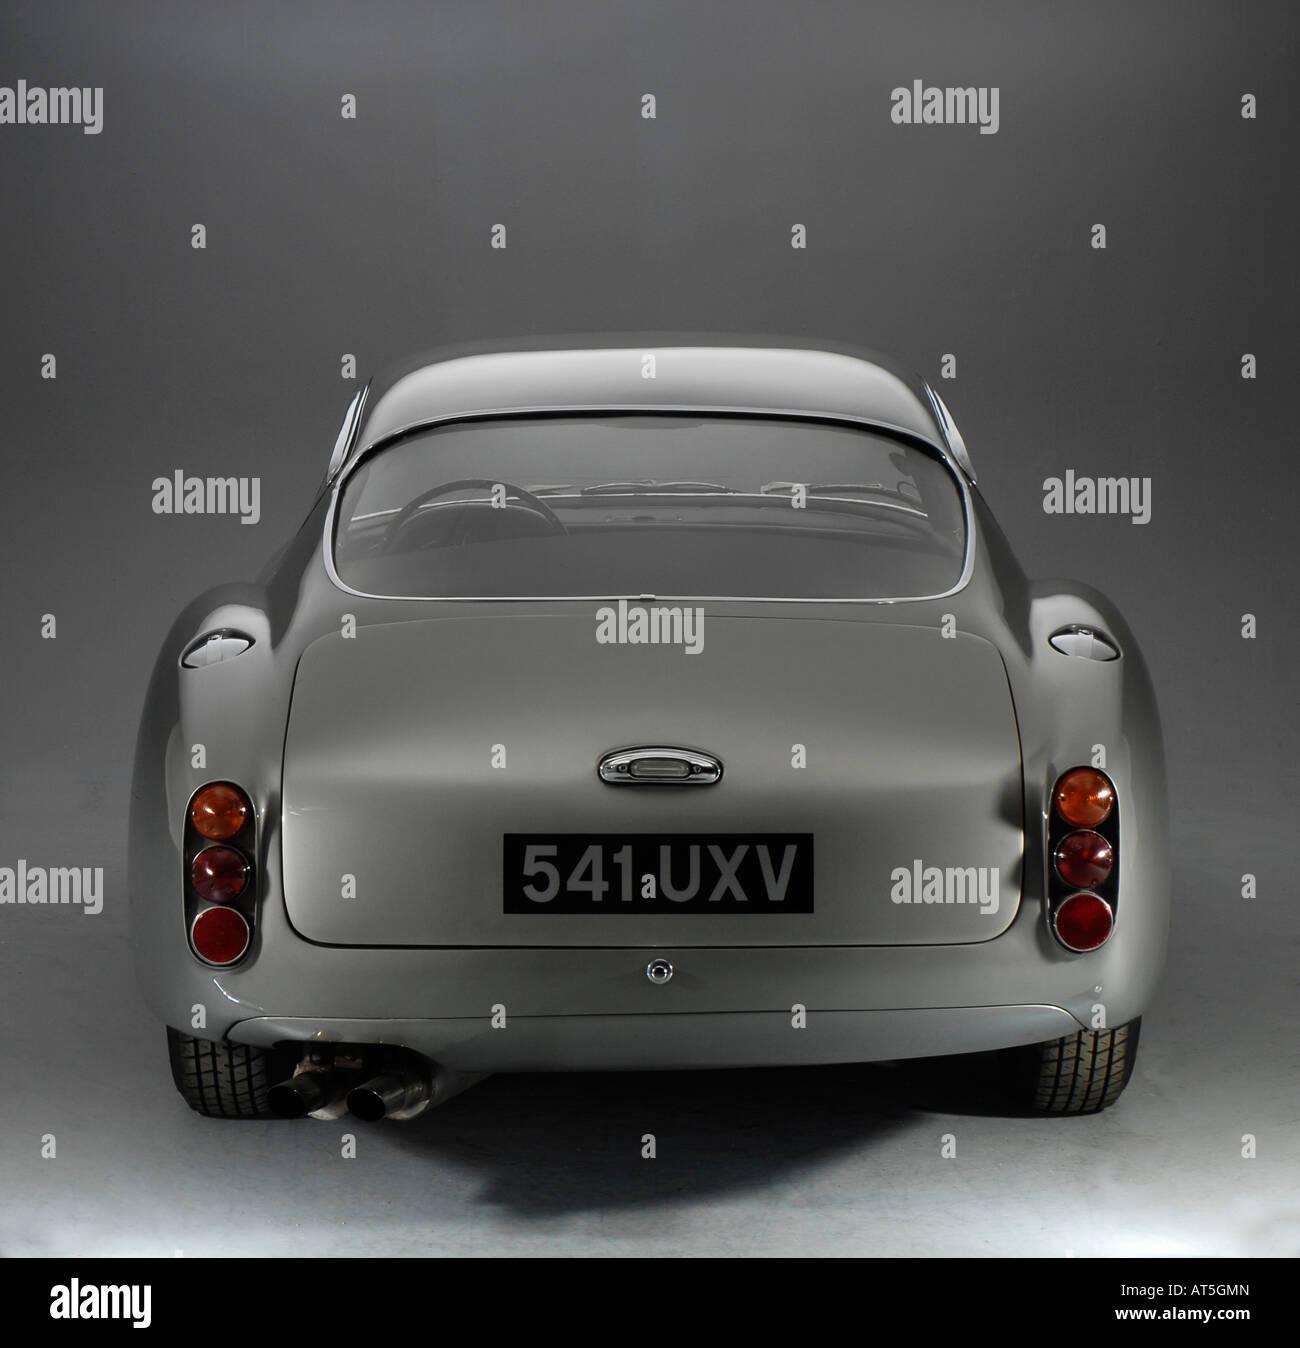 All Types aston db4 zagato : 1961 Aston Martin DB4 GT Zagato rear view Stock Photo, Royalty ...